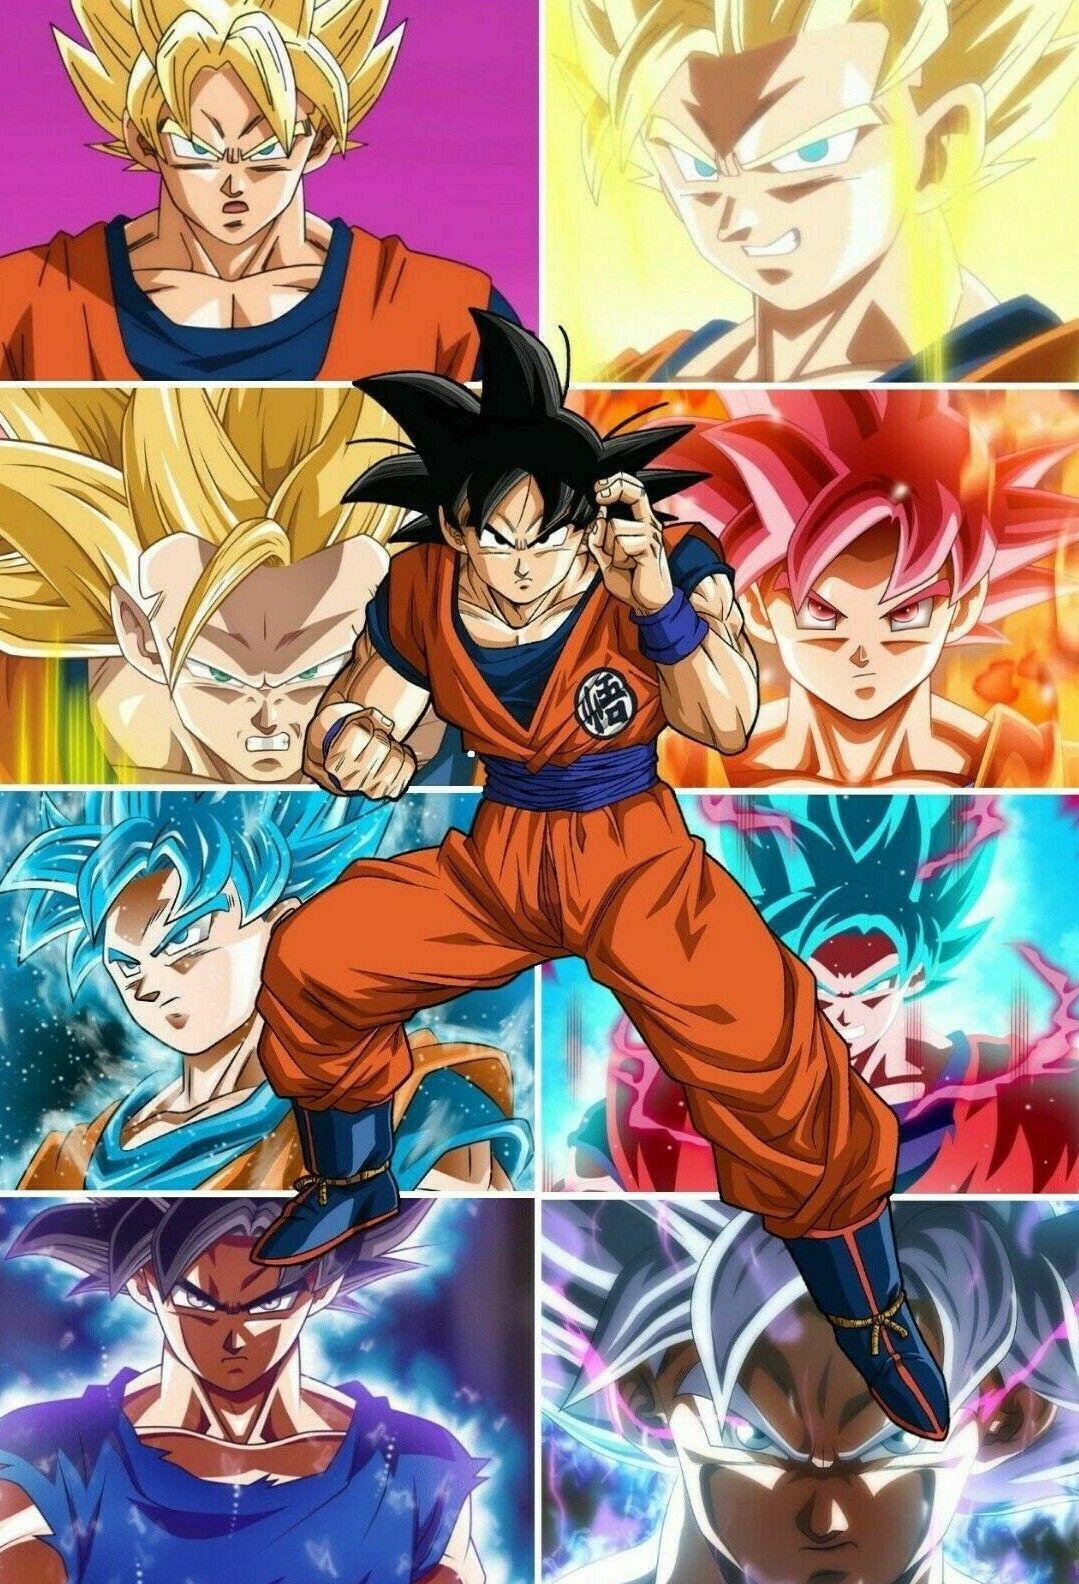 Dragon Ball Z Super Poster Goku All Tranformations Ultra Instinct 11x17 13x19 6 99 In 2021 Anime Dragon Ball Super Dragon Ball Super Goku Dragon Ball Goku